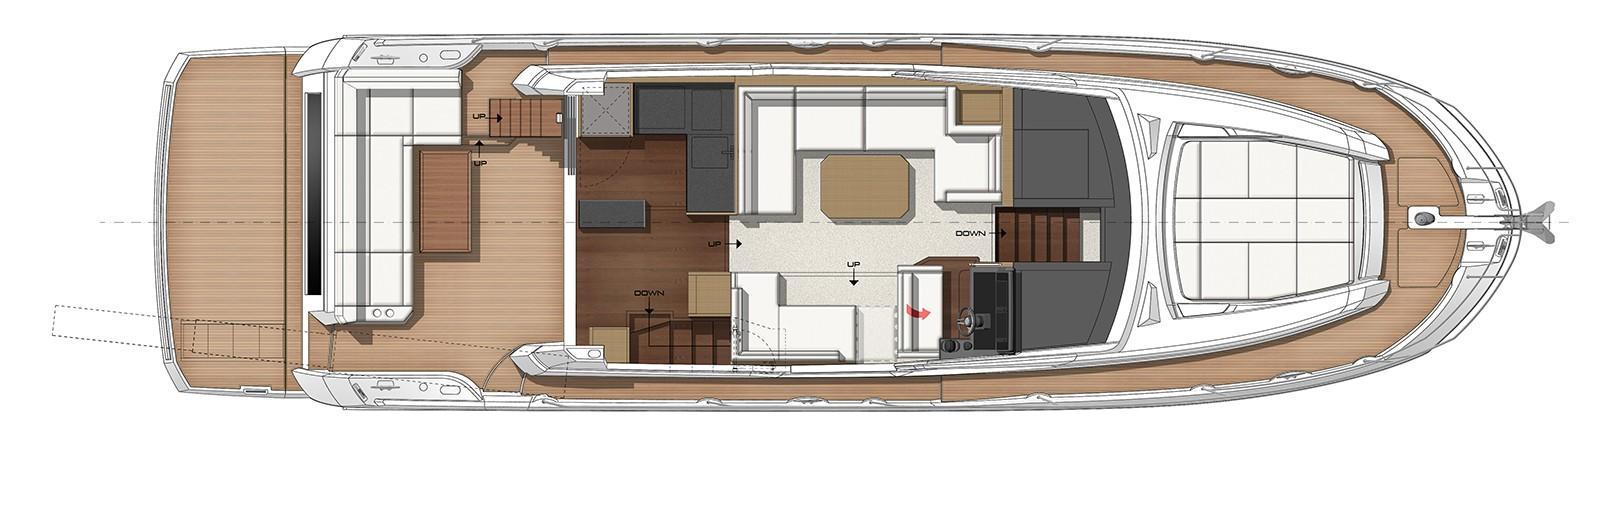 PR5SA-17-06-13-Plan-Pont-